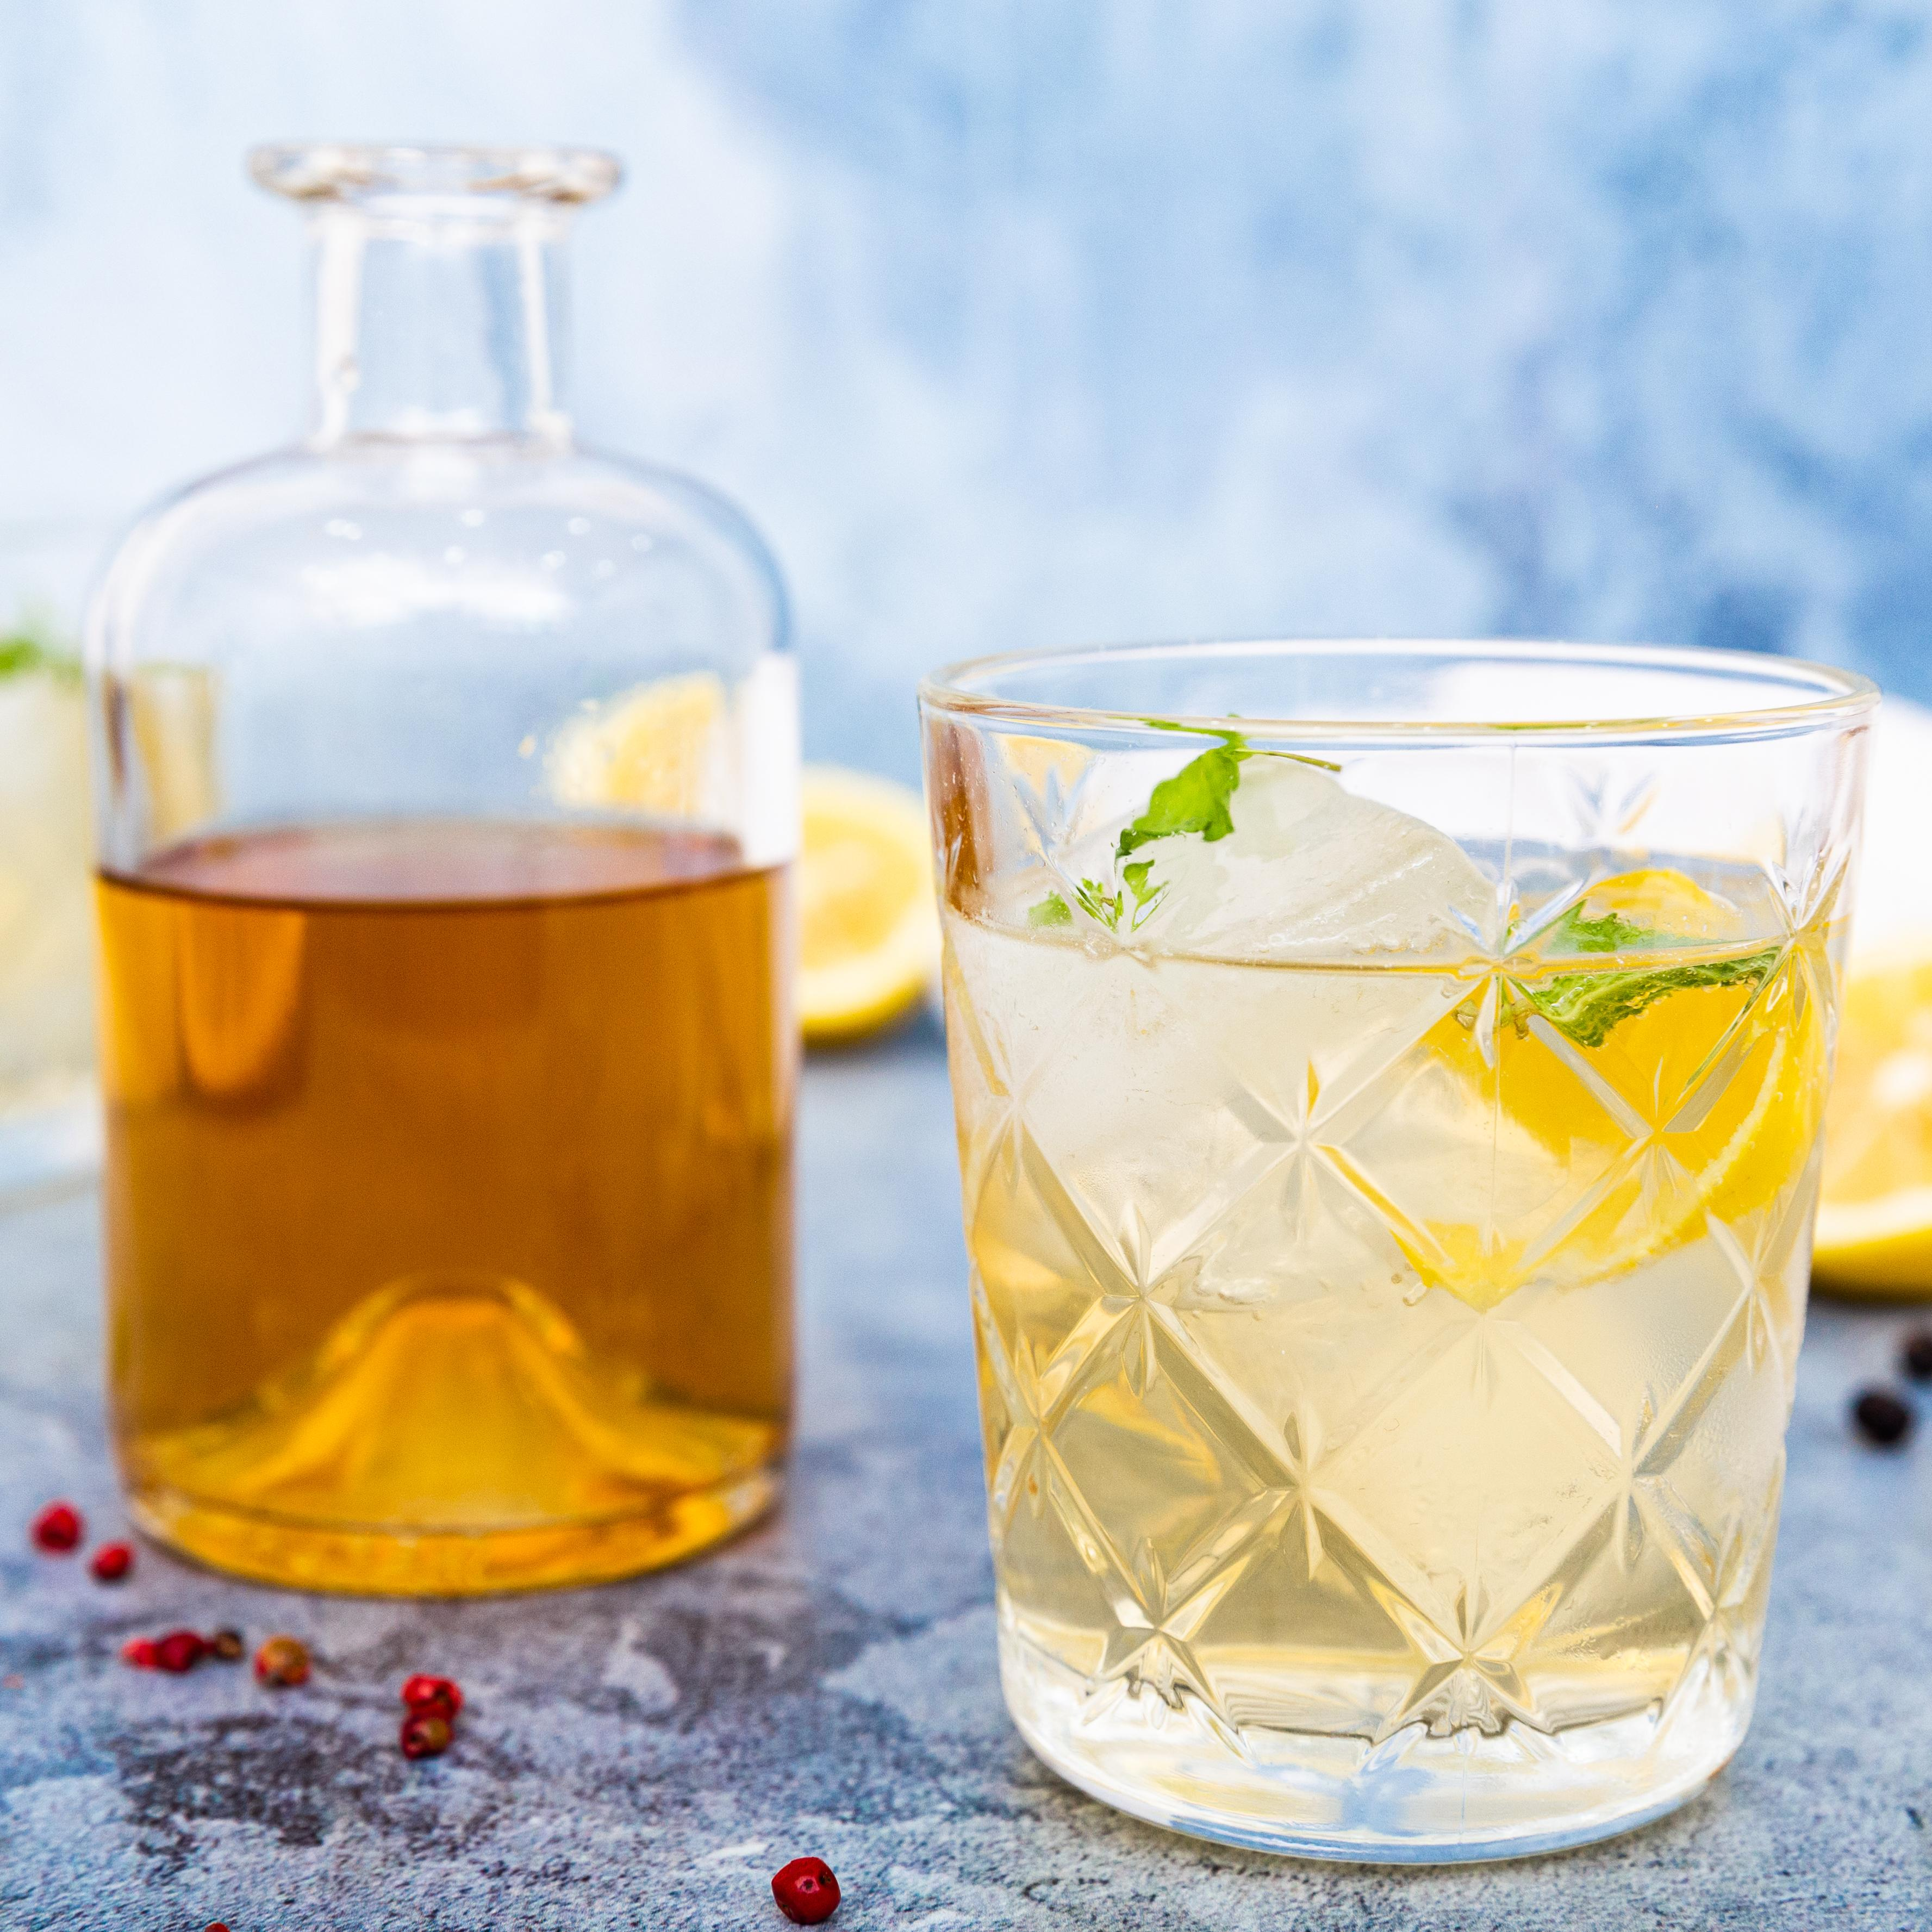 DIY Gin Baukasten